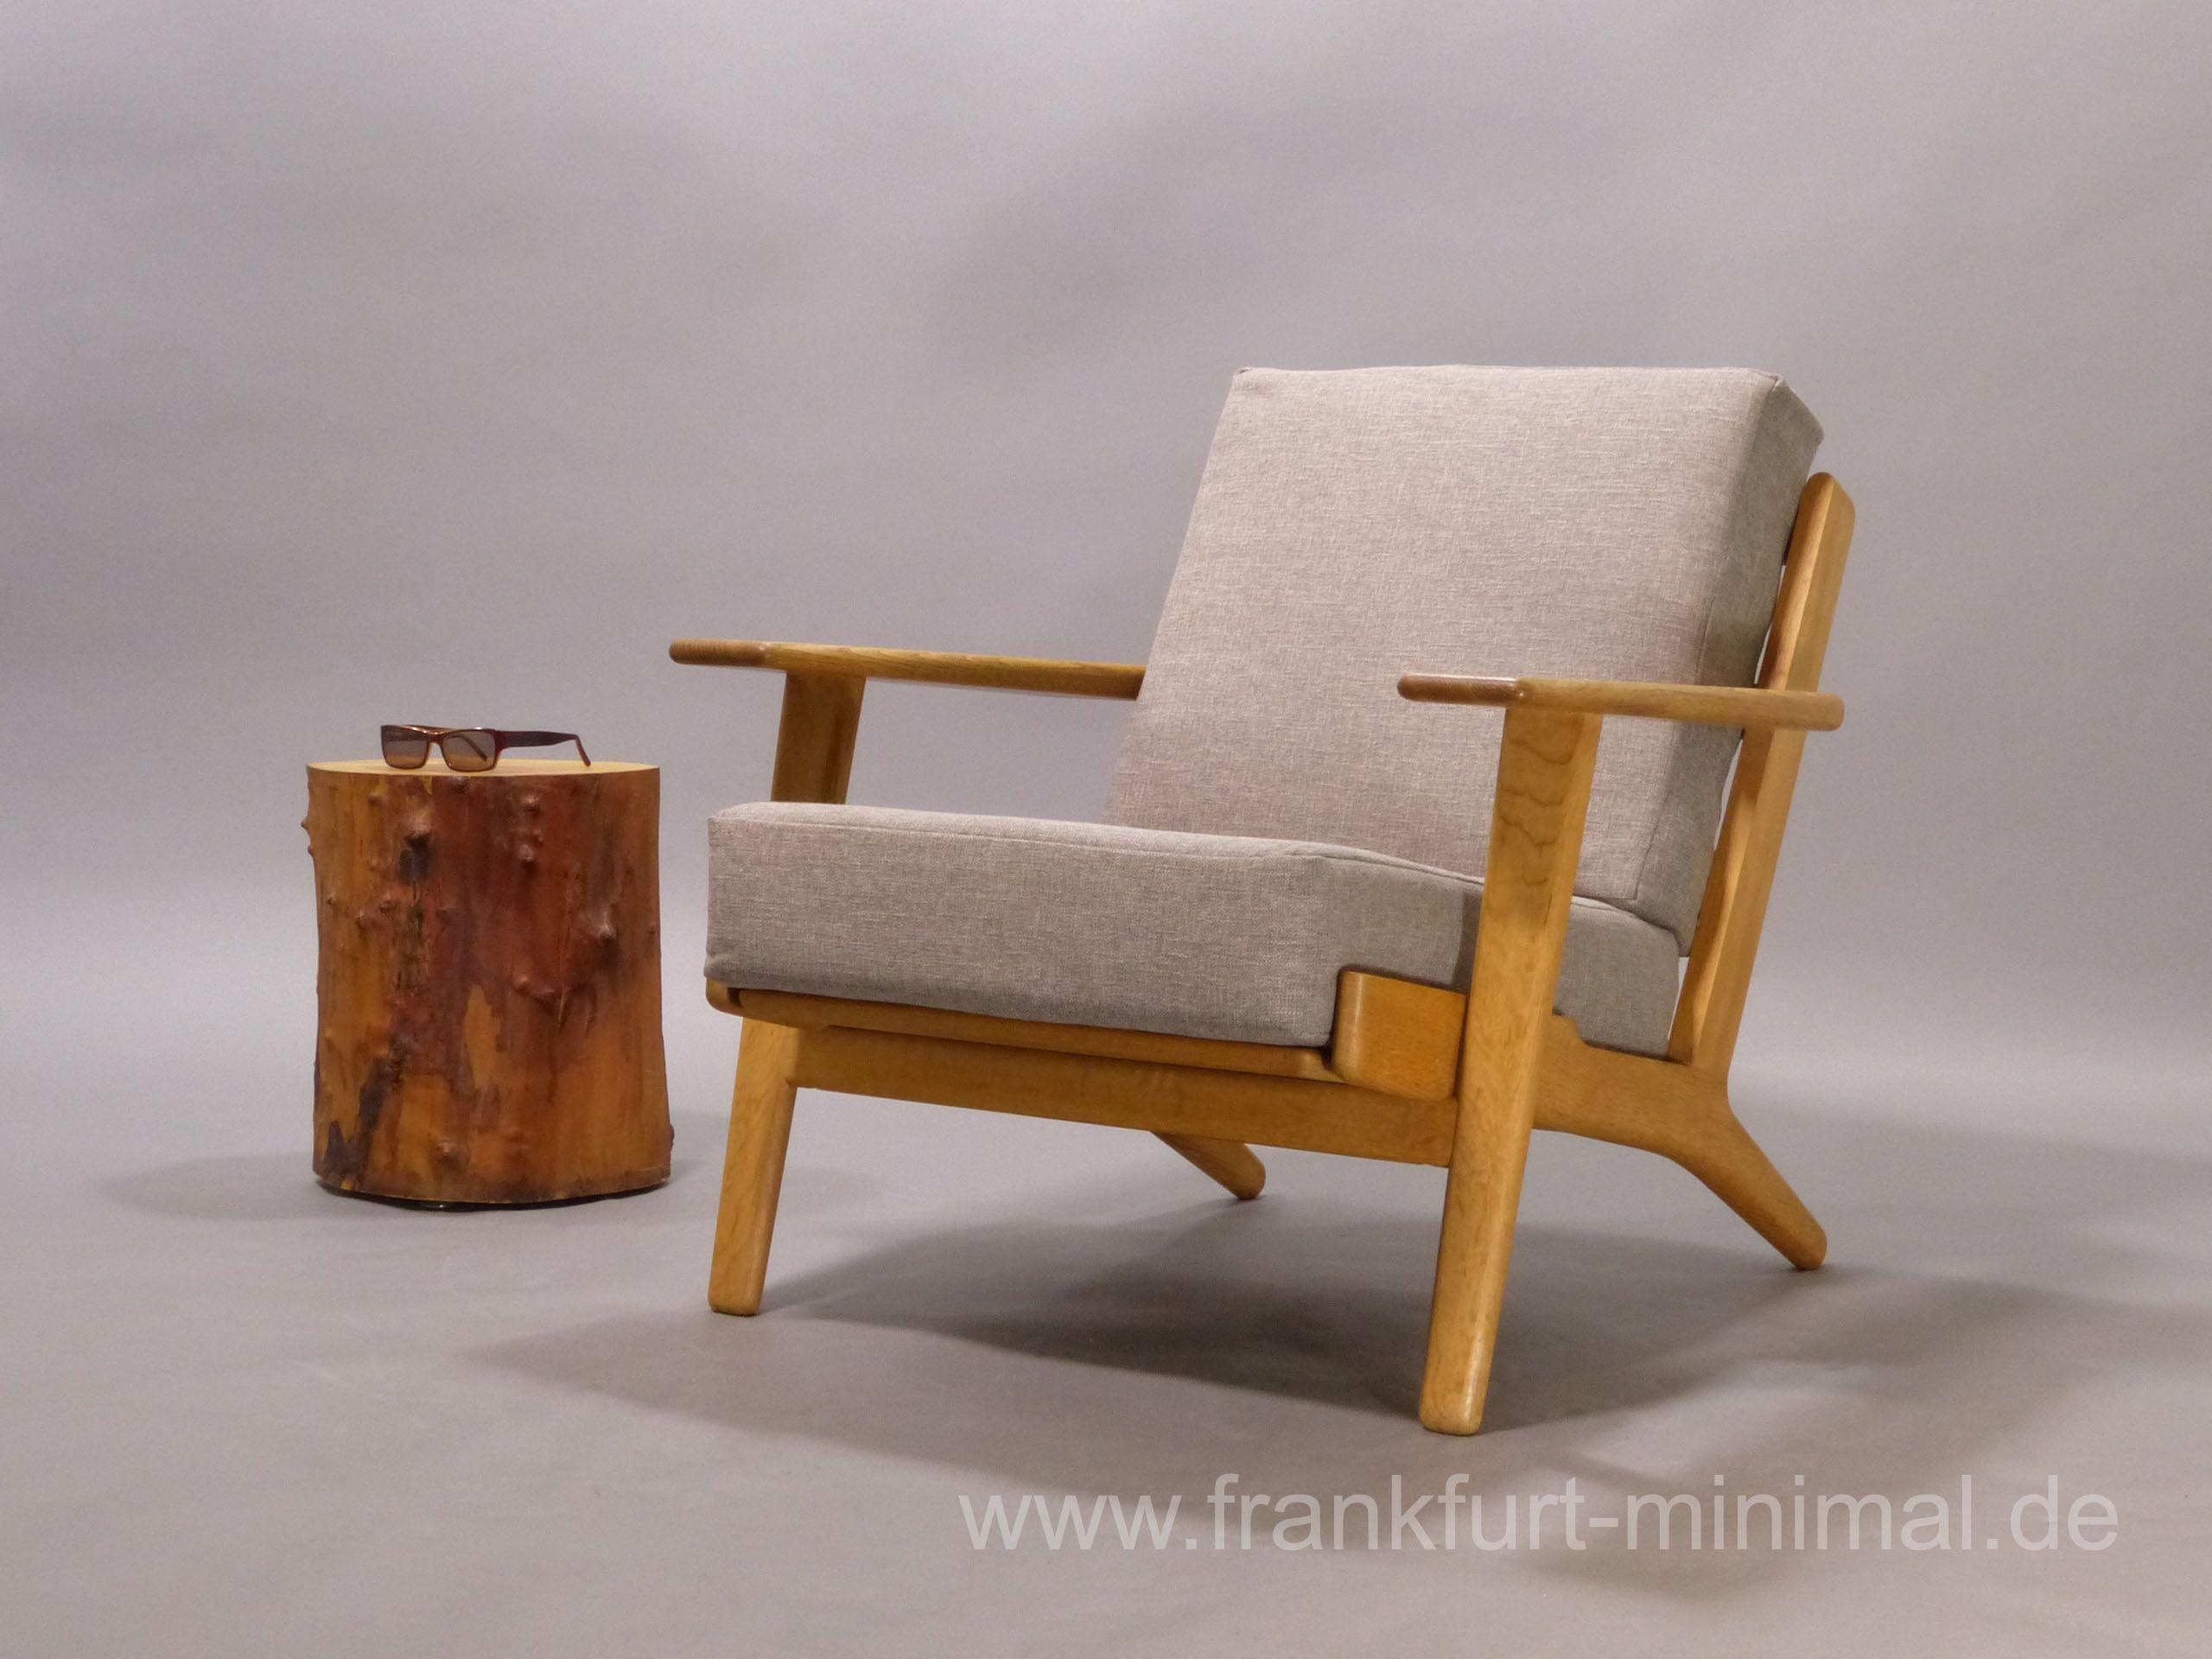 Wegner Sessel hans j. wegner für getama sessel ge 290 design 1953 original aus den